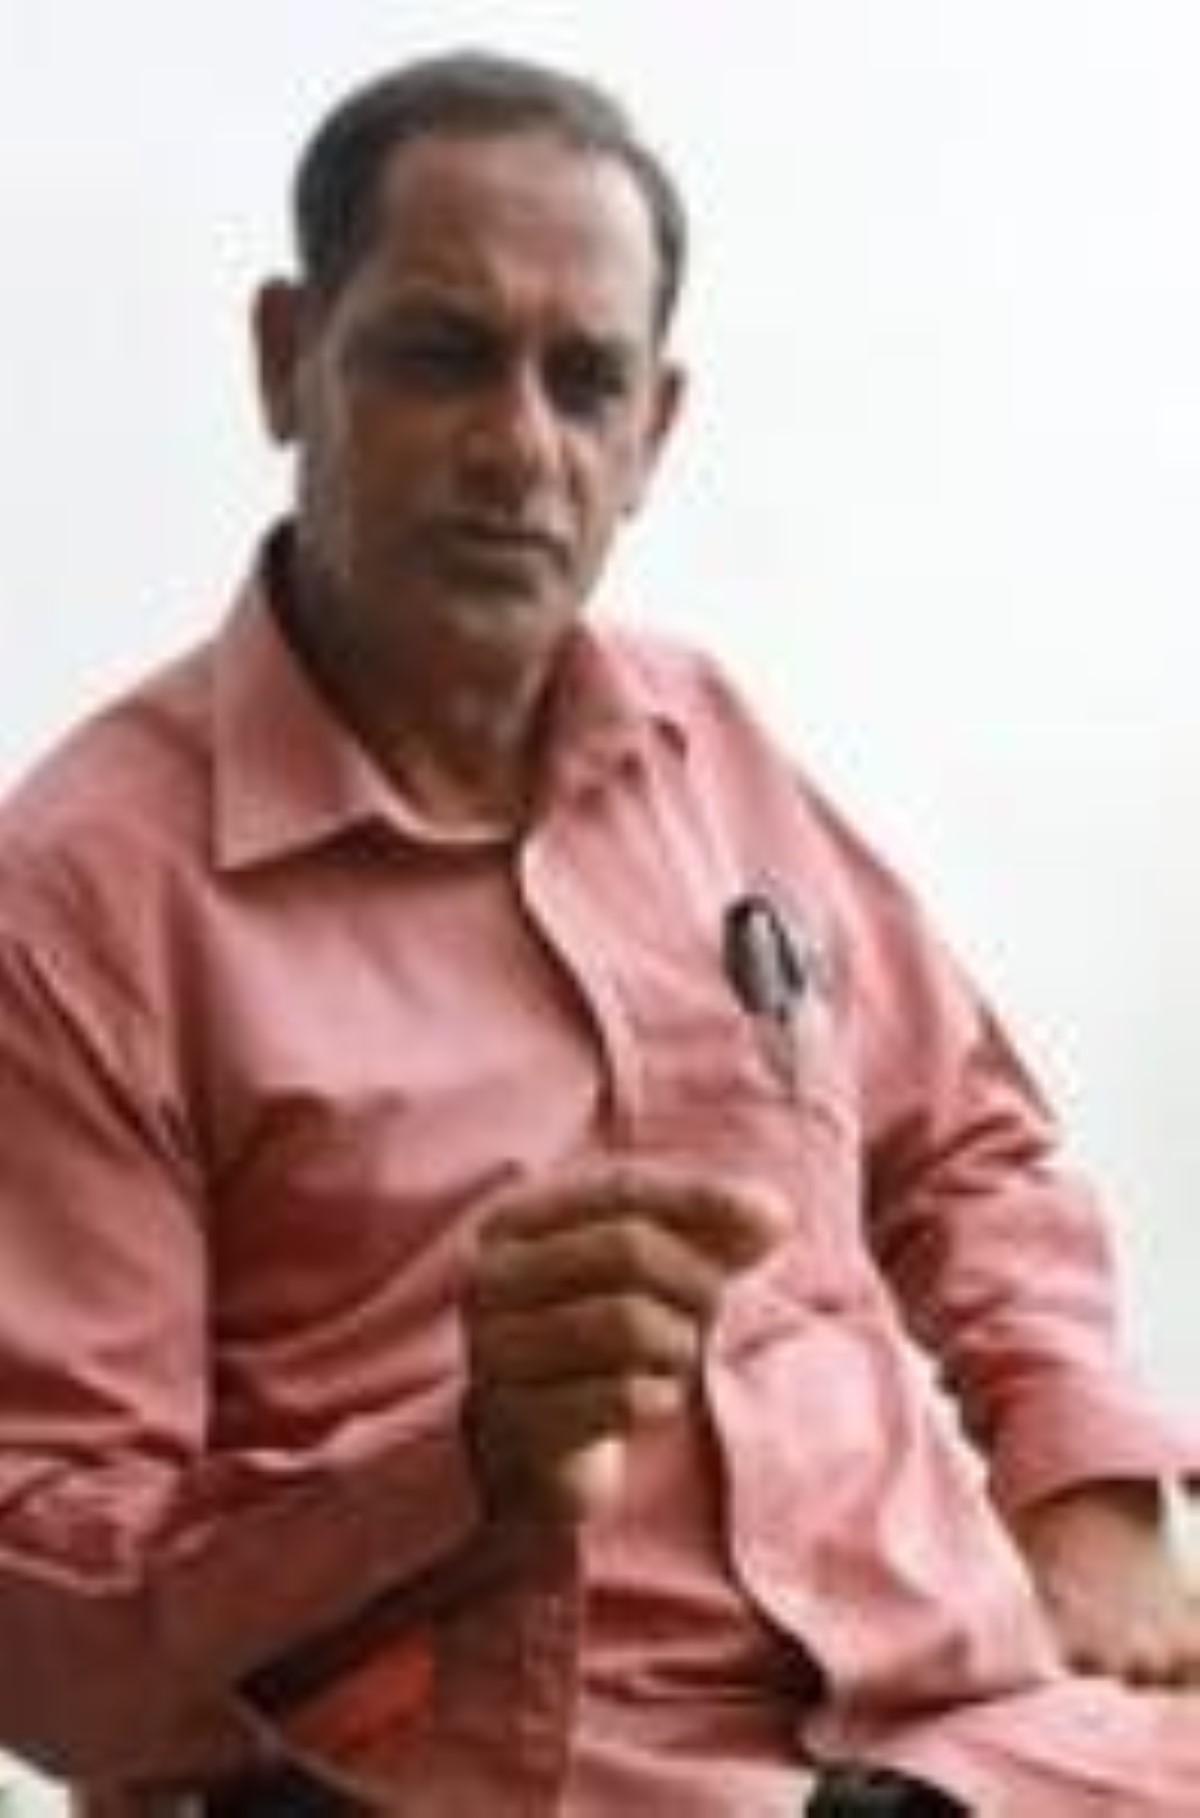 Taxi Grant Scheme : Bahadoor dit non au rabattement fiscal de Rs 100 000